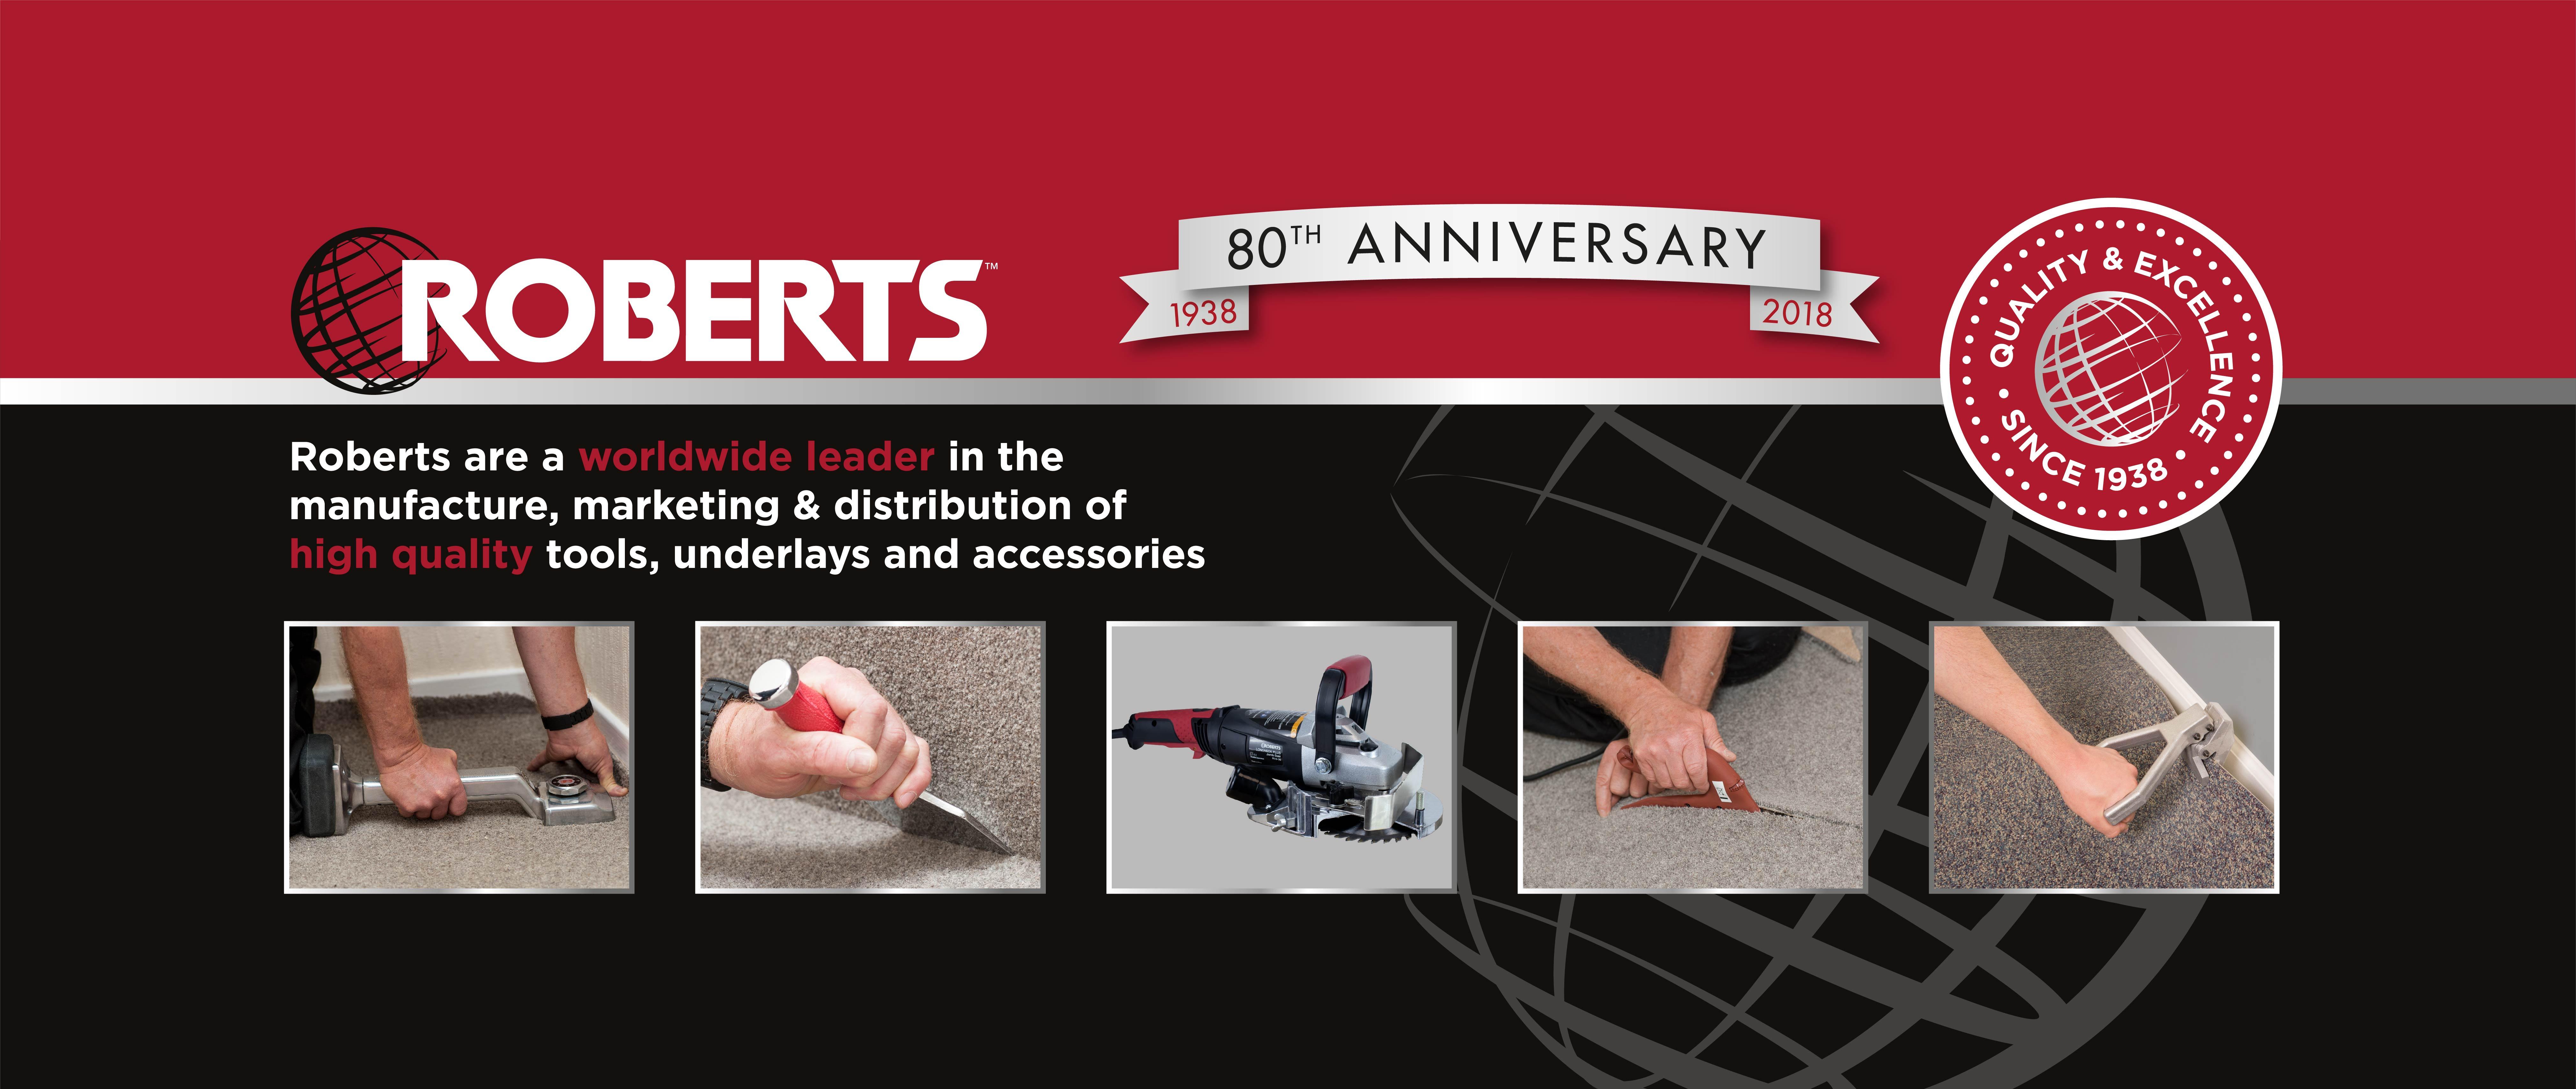 B-R-033-Sliders-for-Roberts-Website-V2-one-01-01